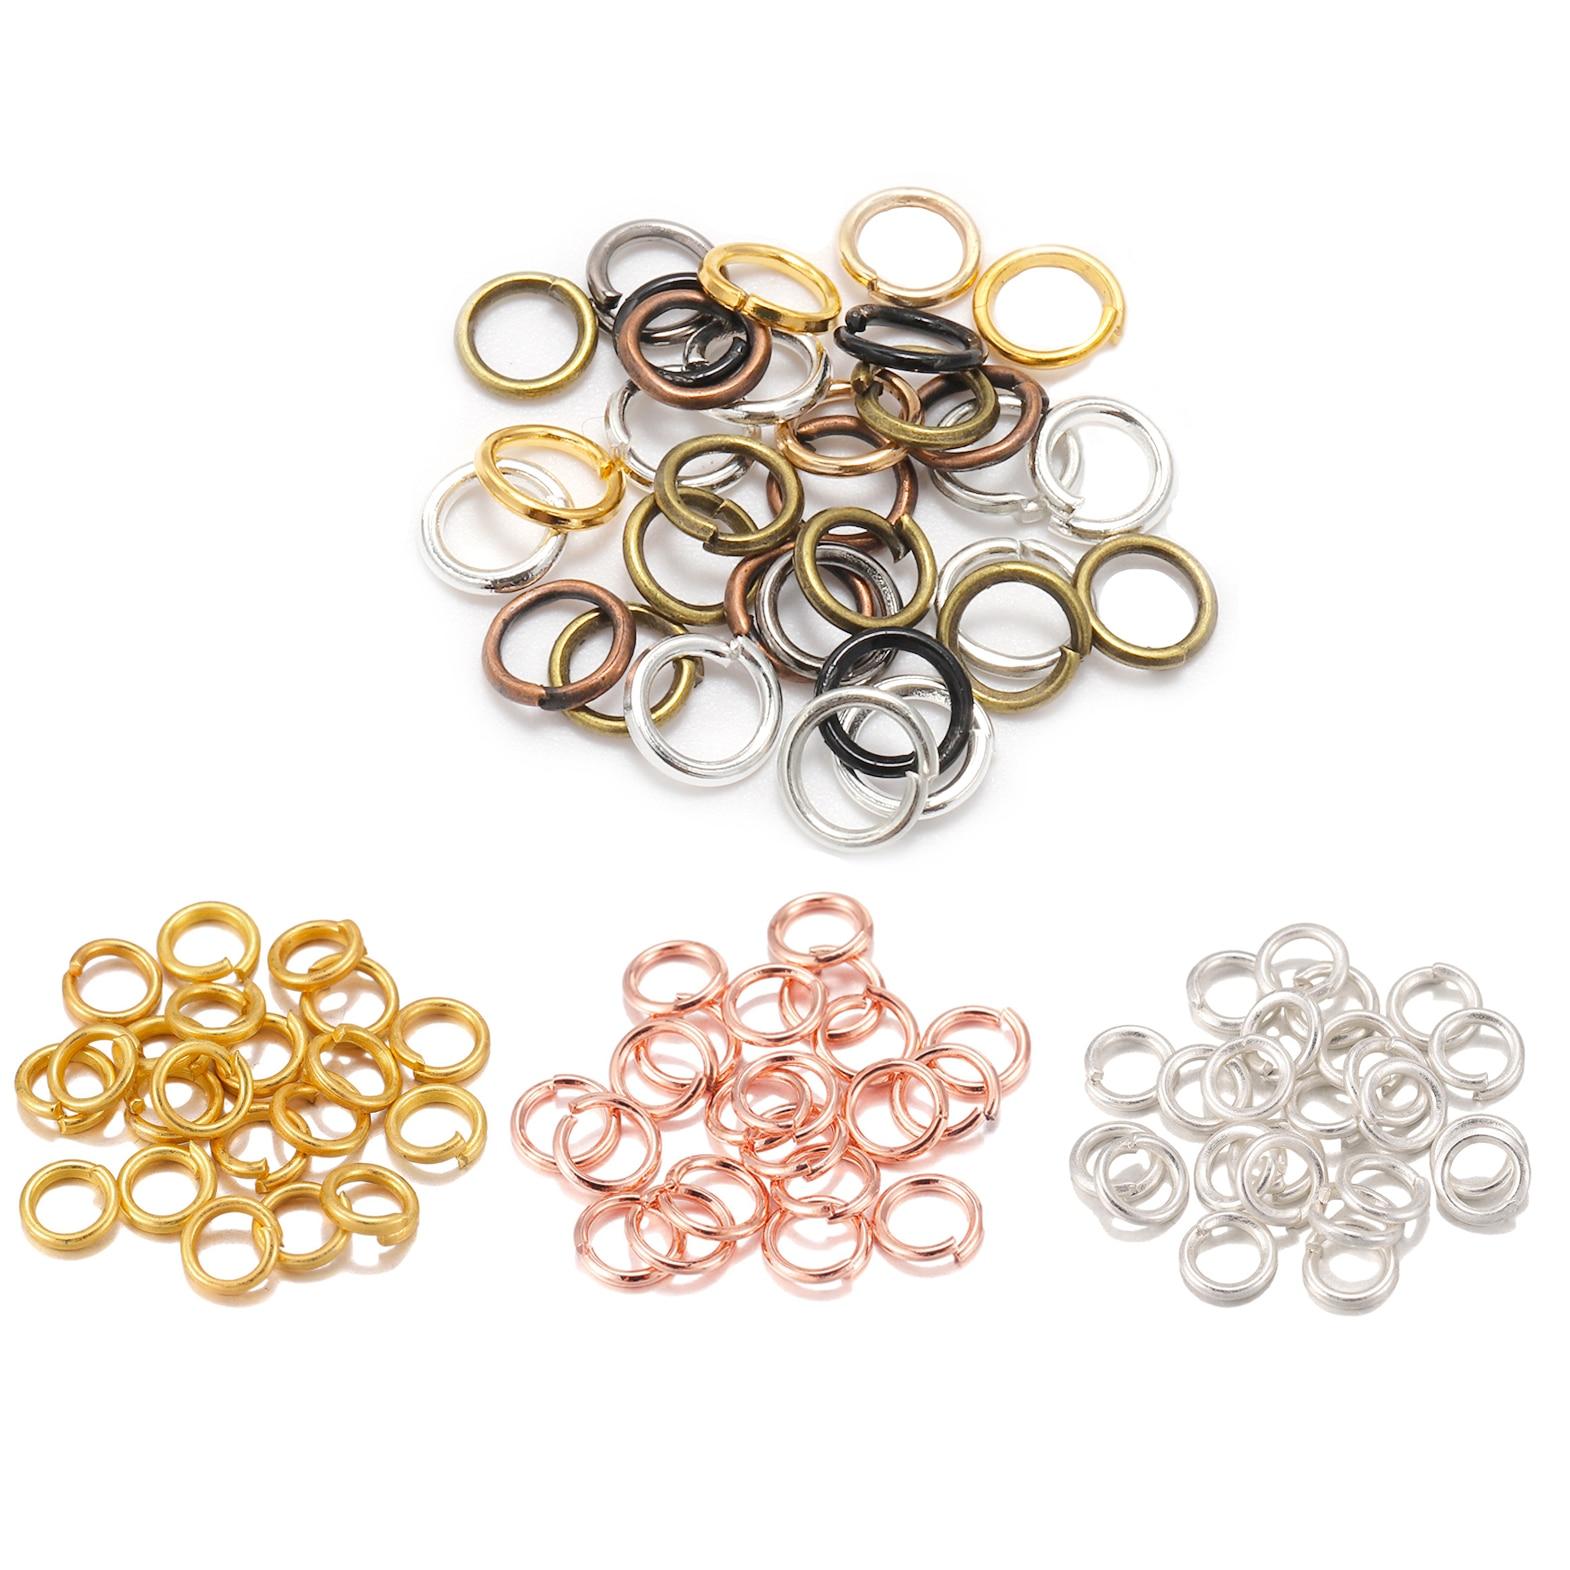 200 pçs 3-16mm ouro ródio metal saltar anel aberto único loops split anéis suprimentos para diy jóias acessórios artesanais